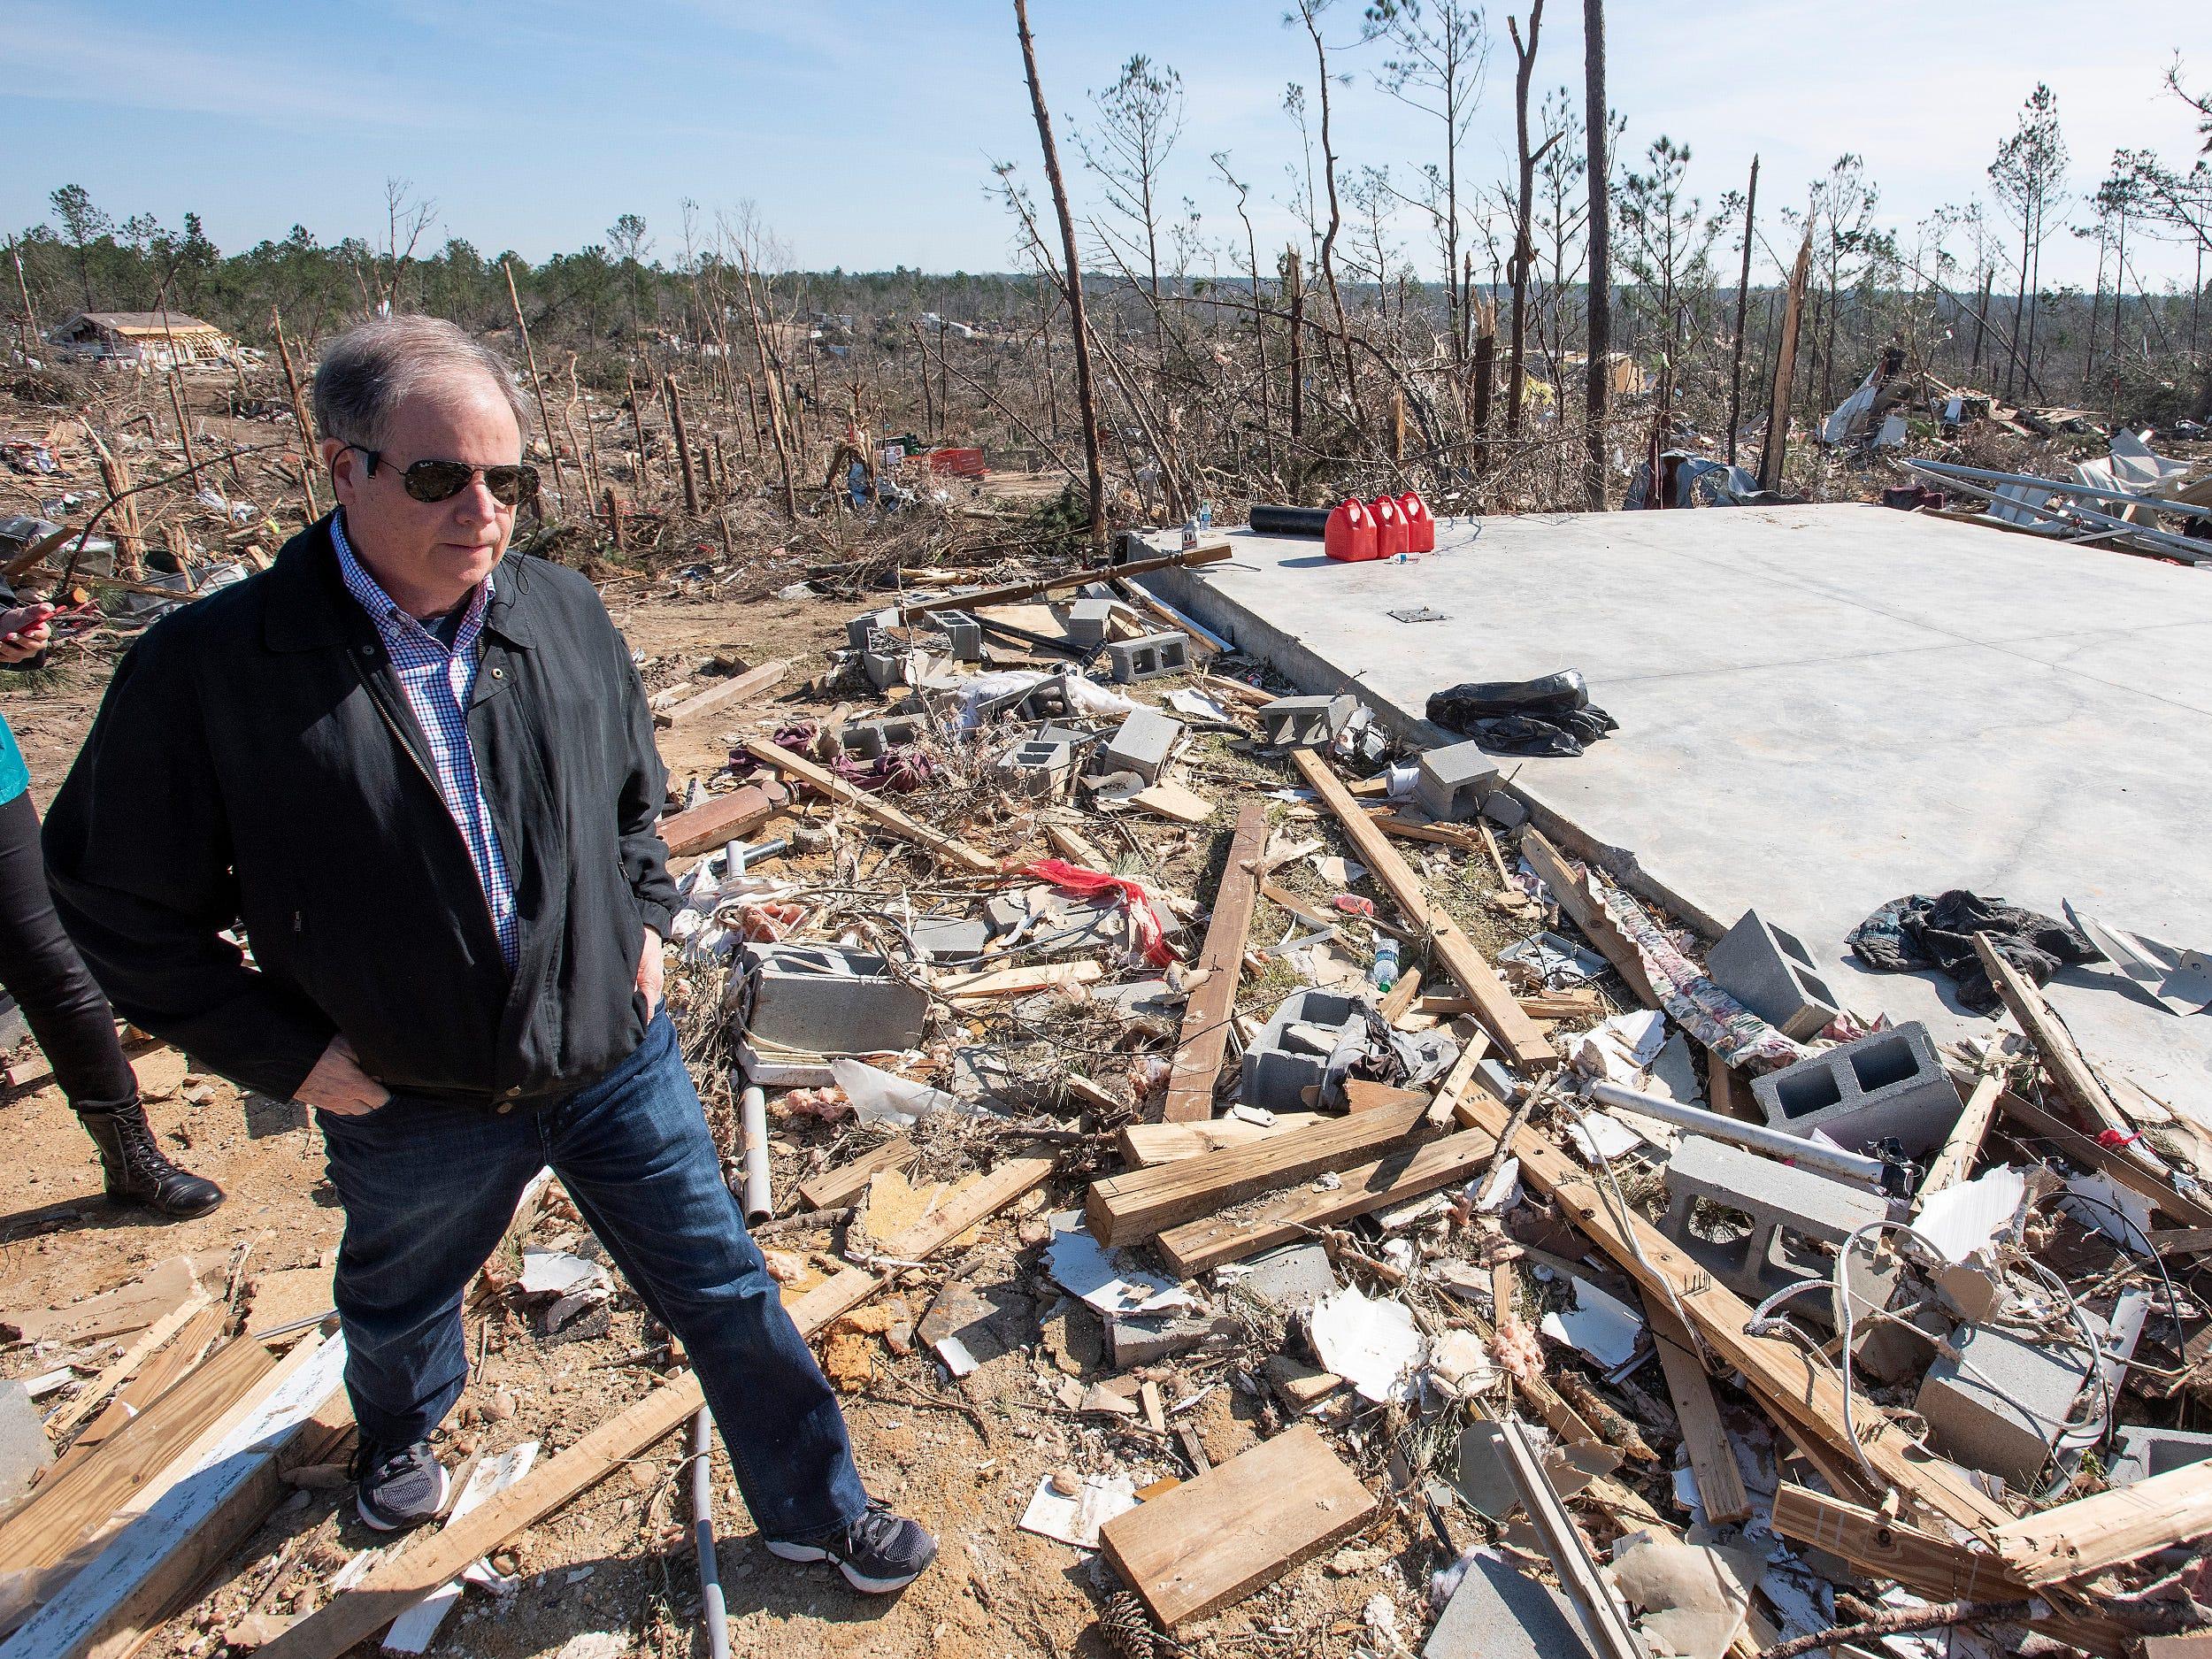 Sen. Doug Jones, D-Ala., tours tornado damage in Beauregard, Ala., on March 7, 2019.